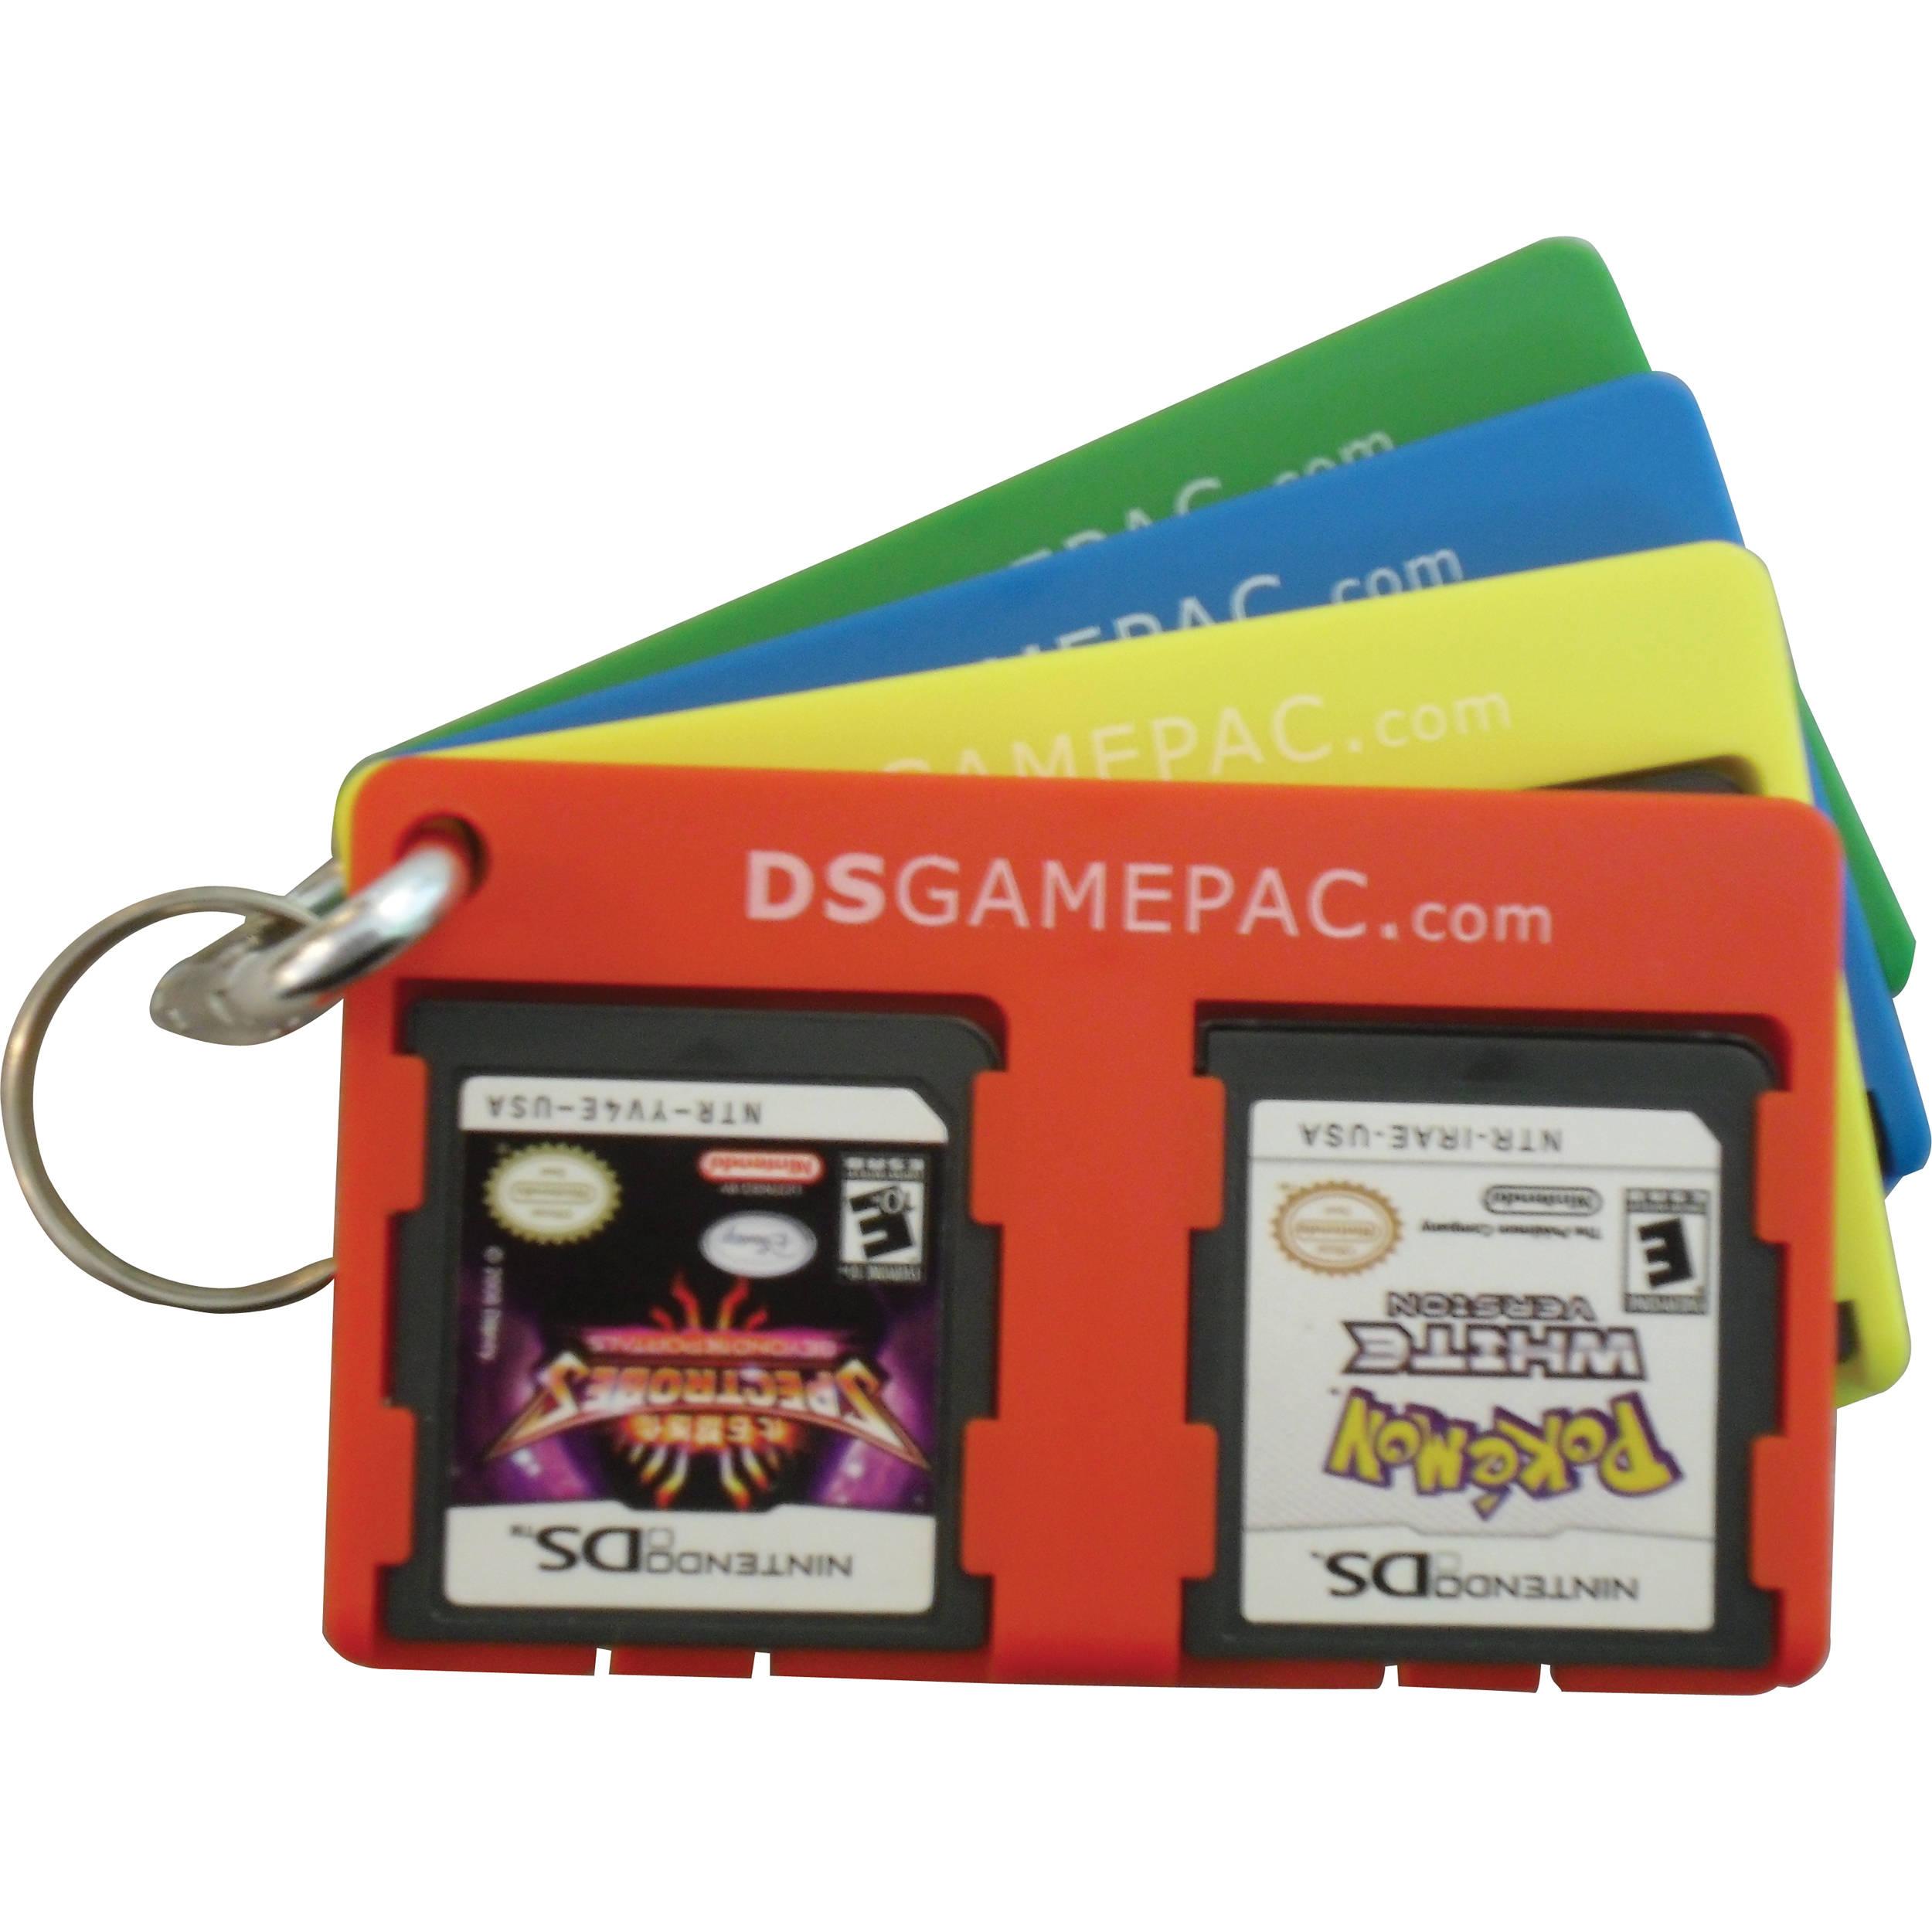 Sd Card Holder Ds Gamepac Cardholder For Nintendo 73011gp Bh Lite Edge Game Cartridges